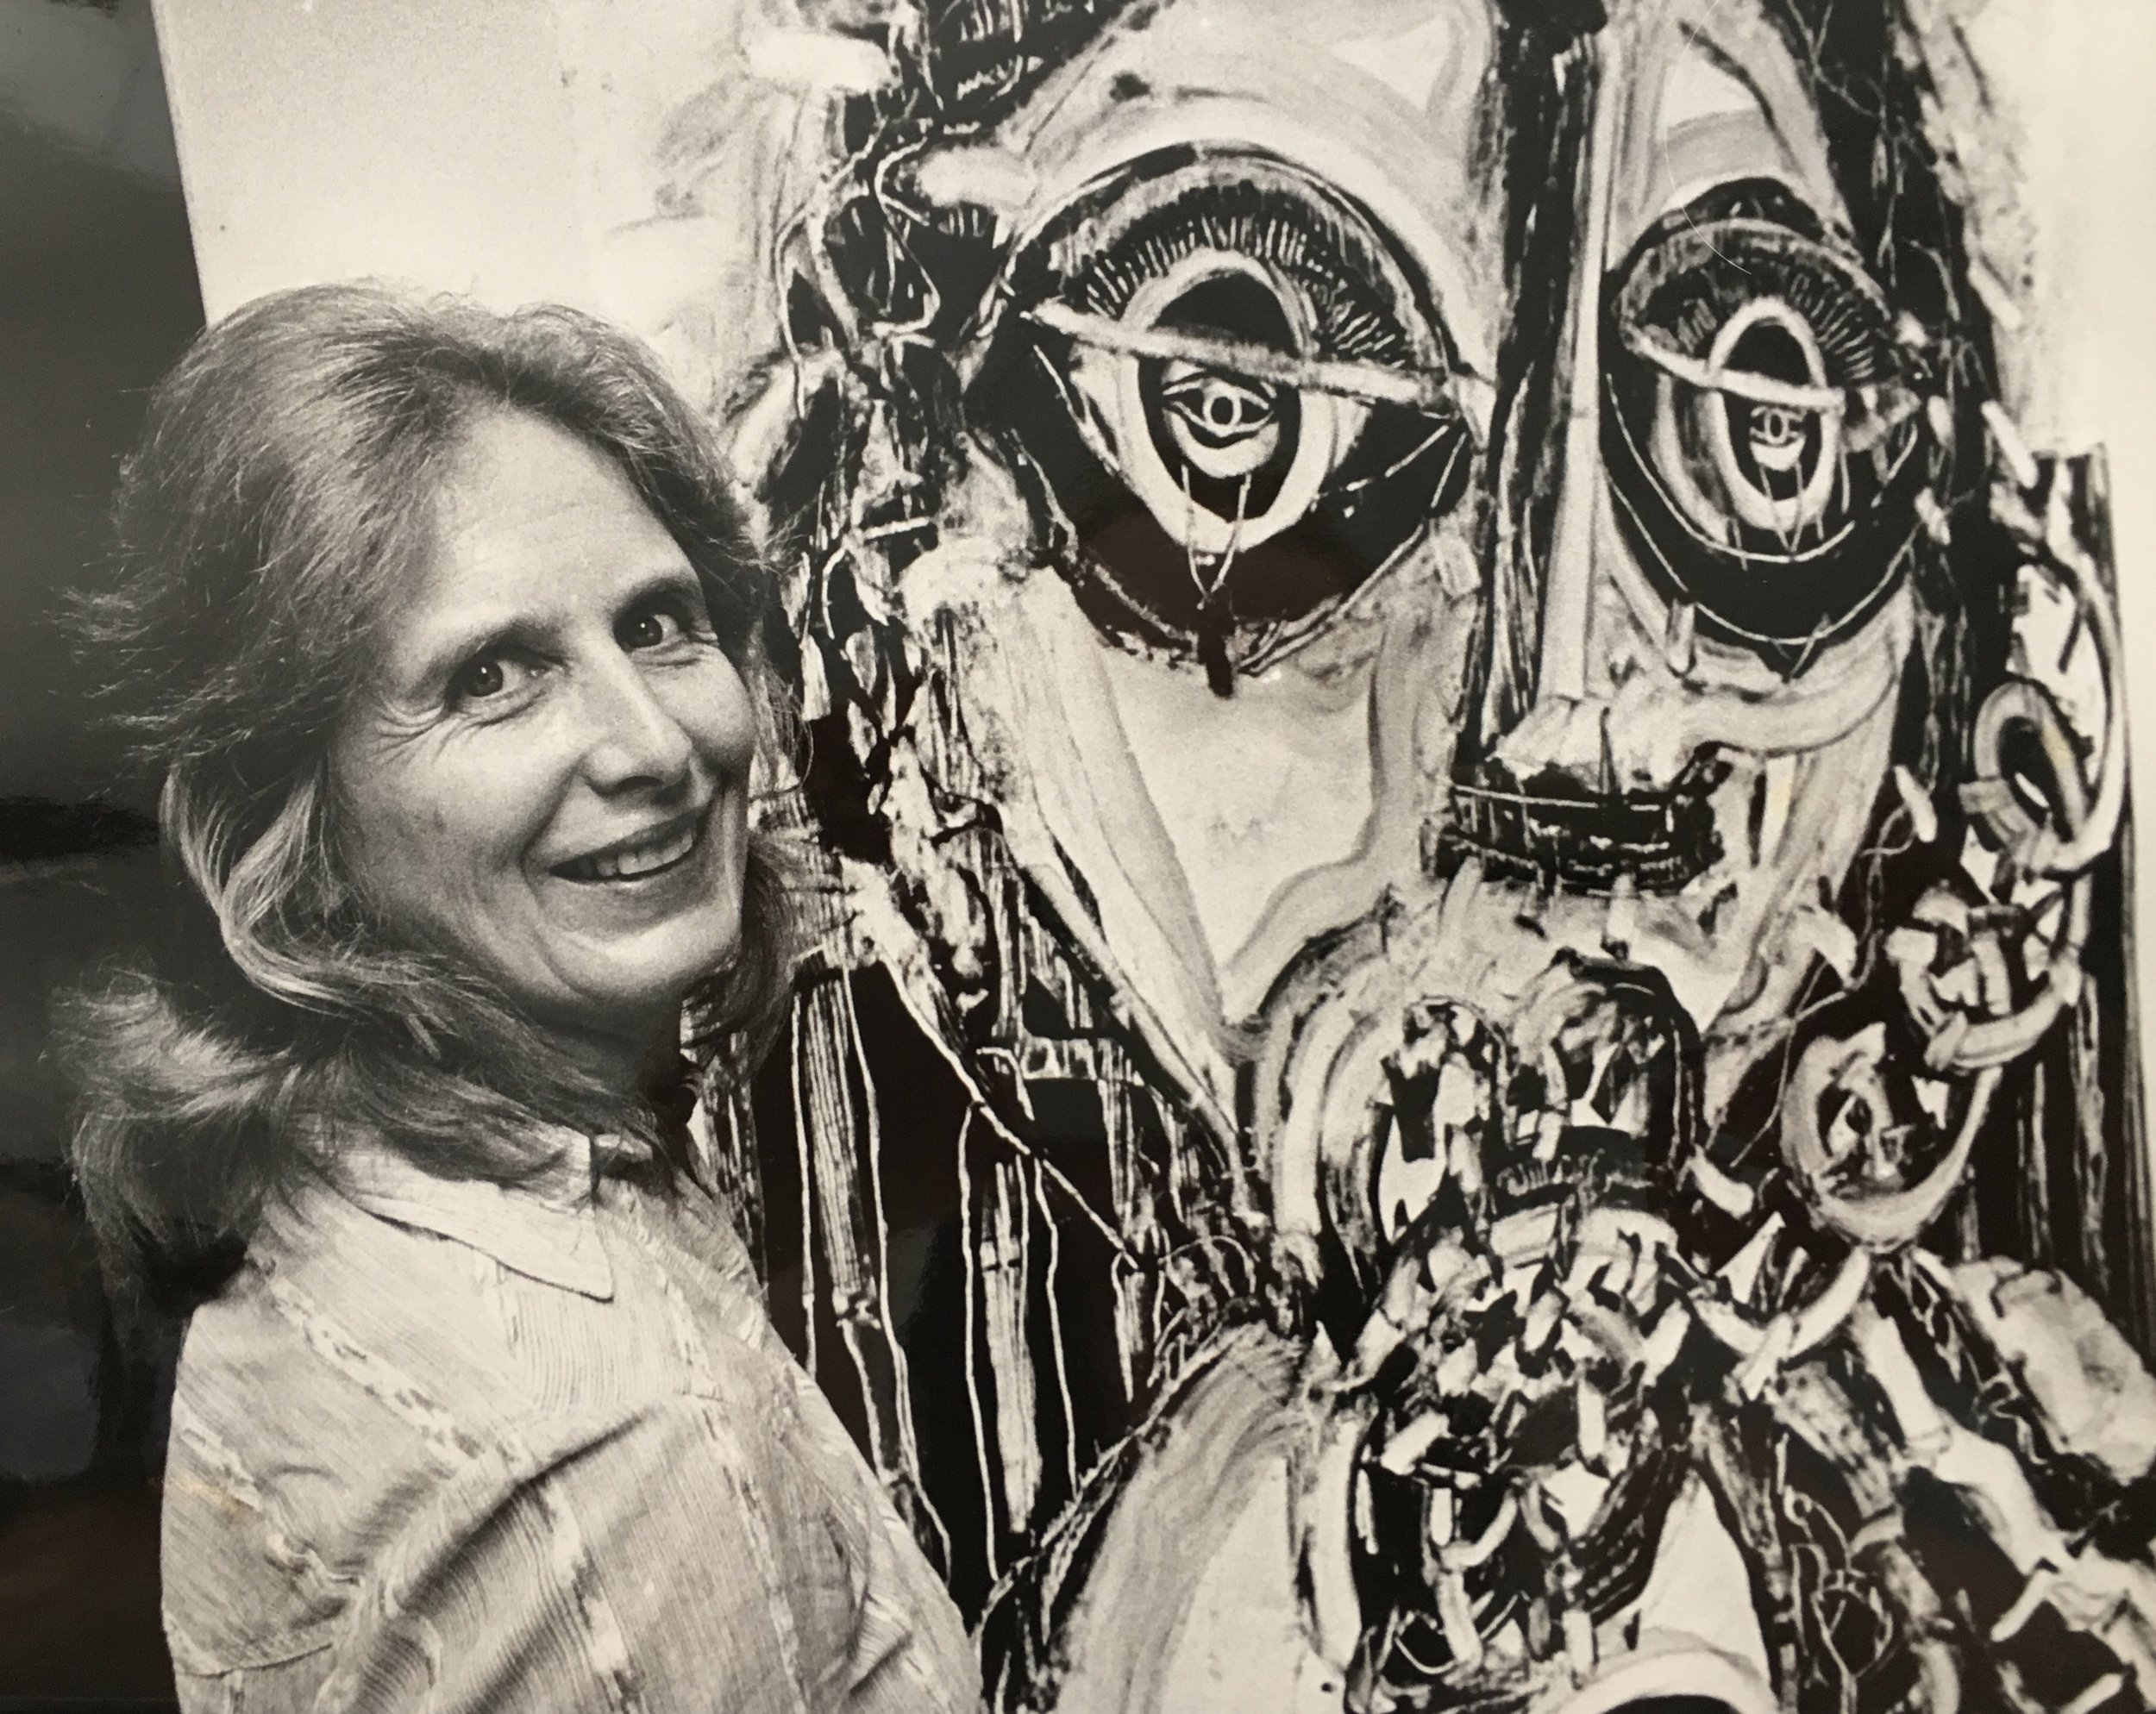 Margo Allman, circa 1980s, photo credit: Carson Zullinger